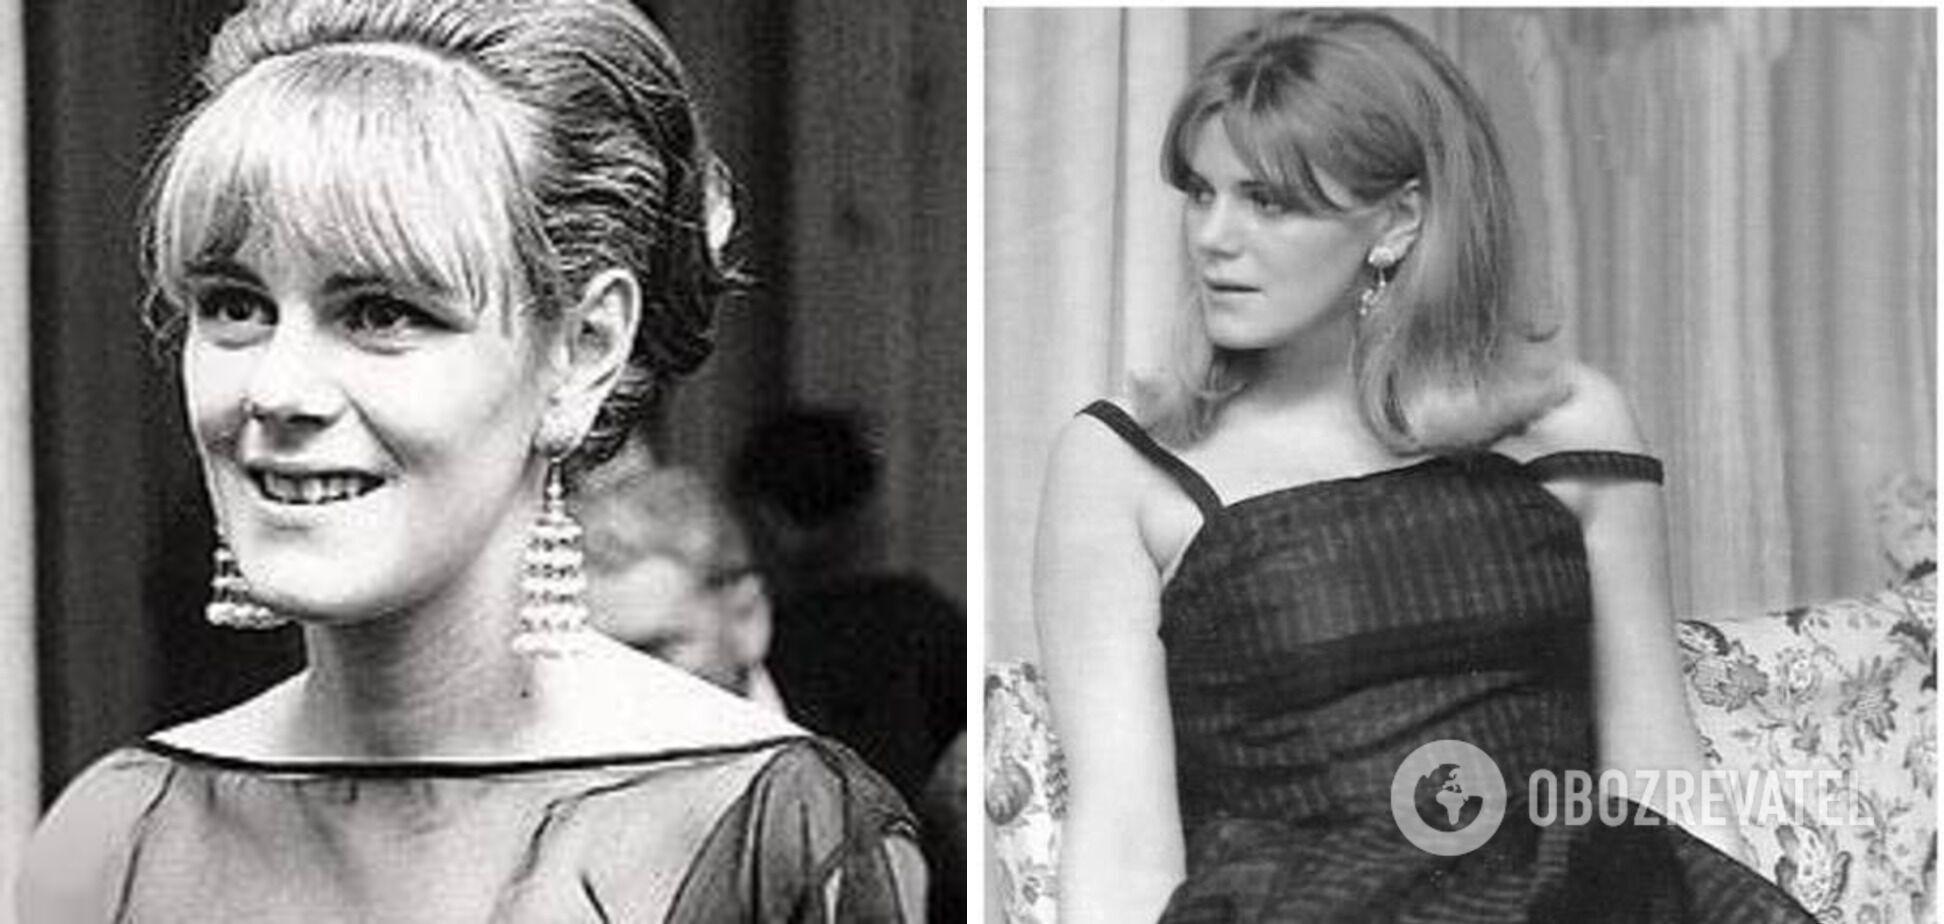 Вторая жена принца Чарльза – Камилла Паркер.